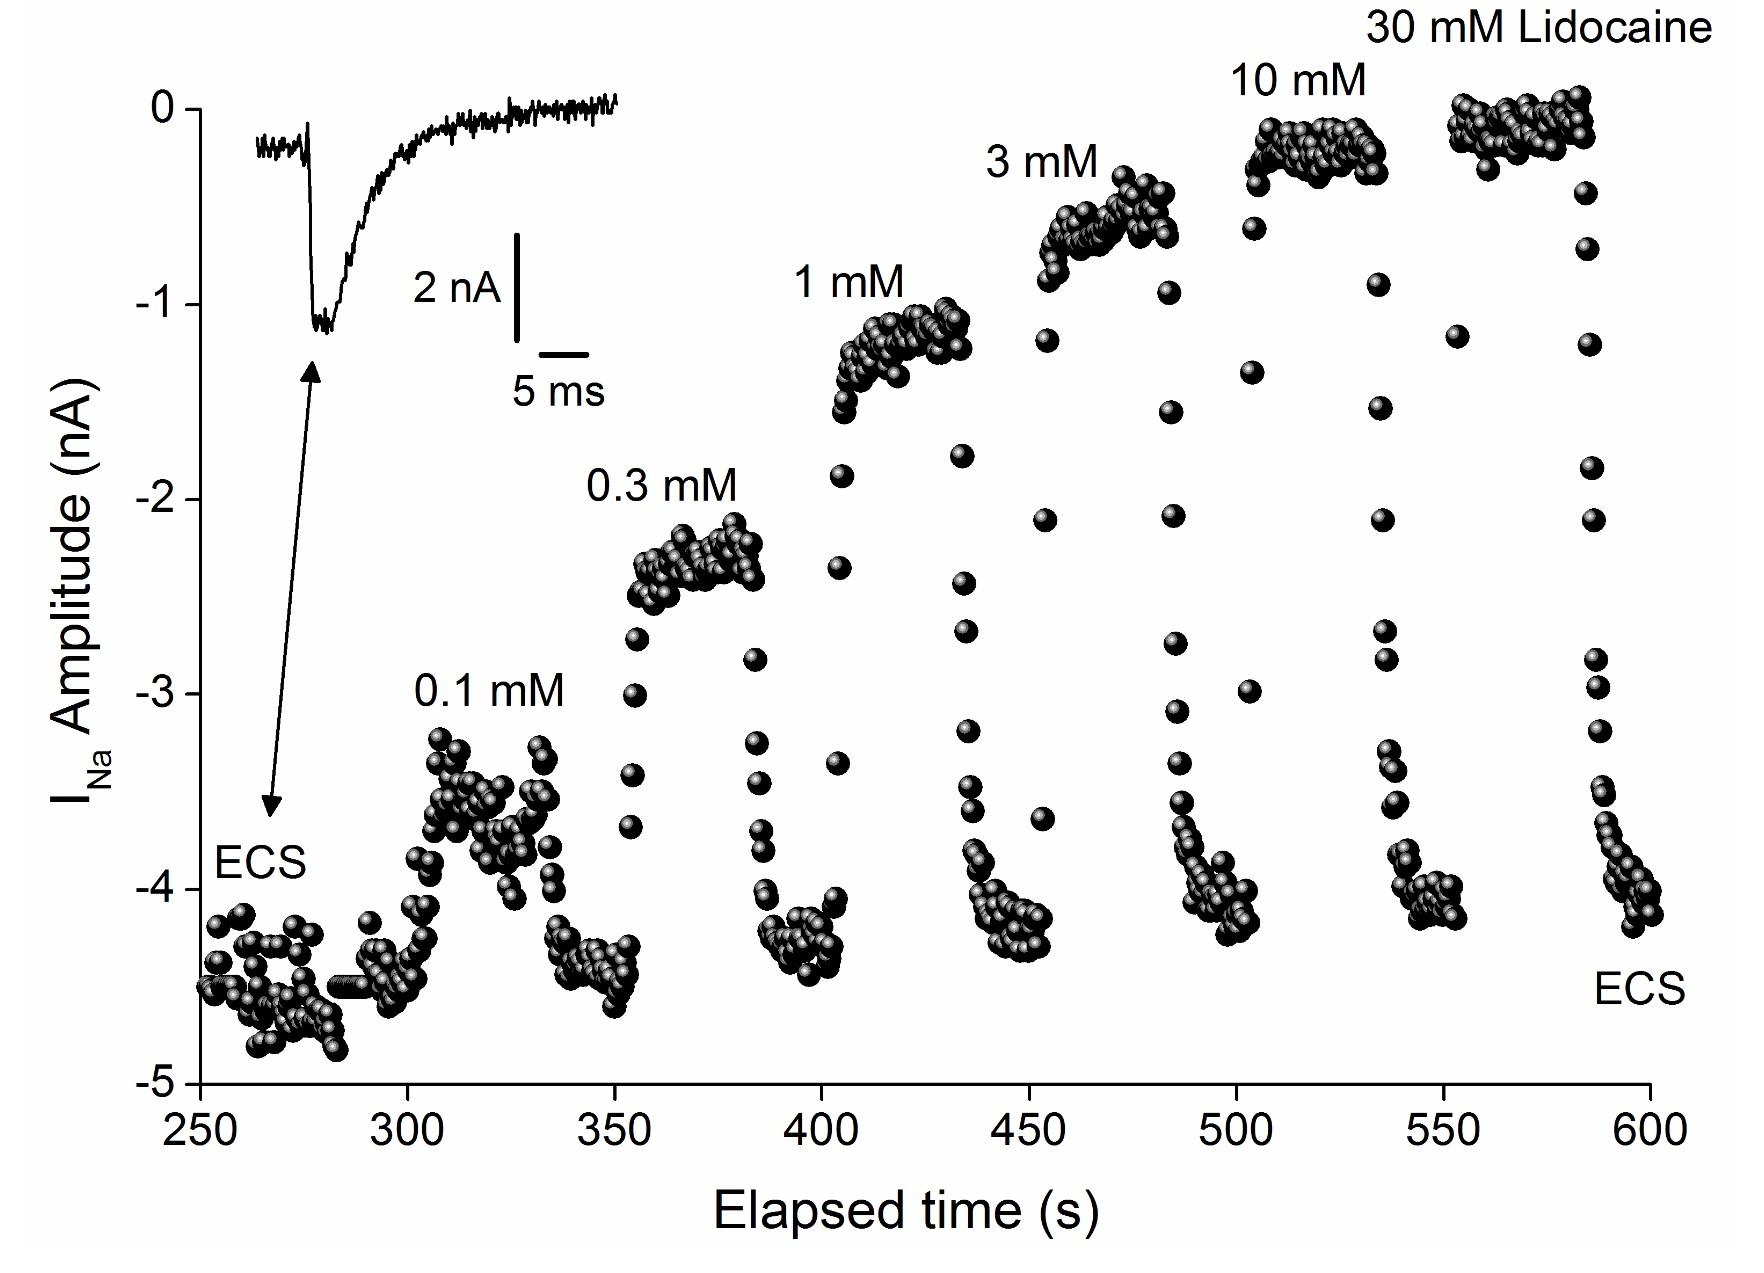 Nav 1.8 LIdocaine dose response